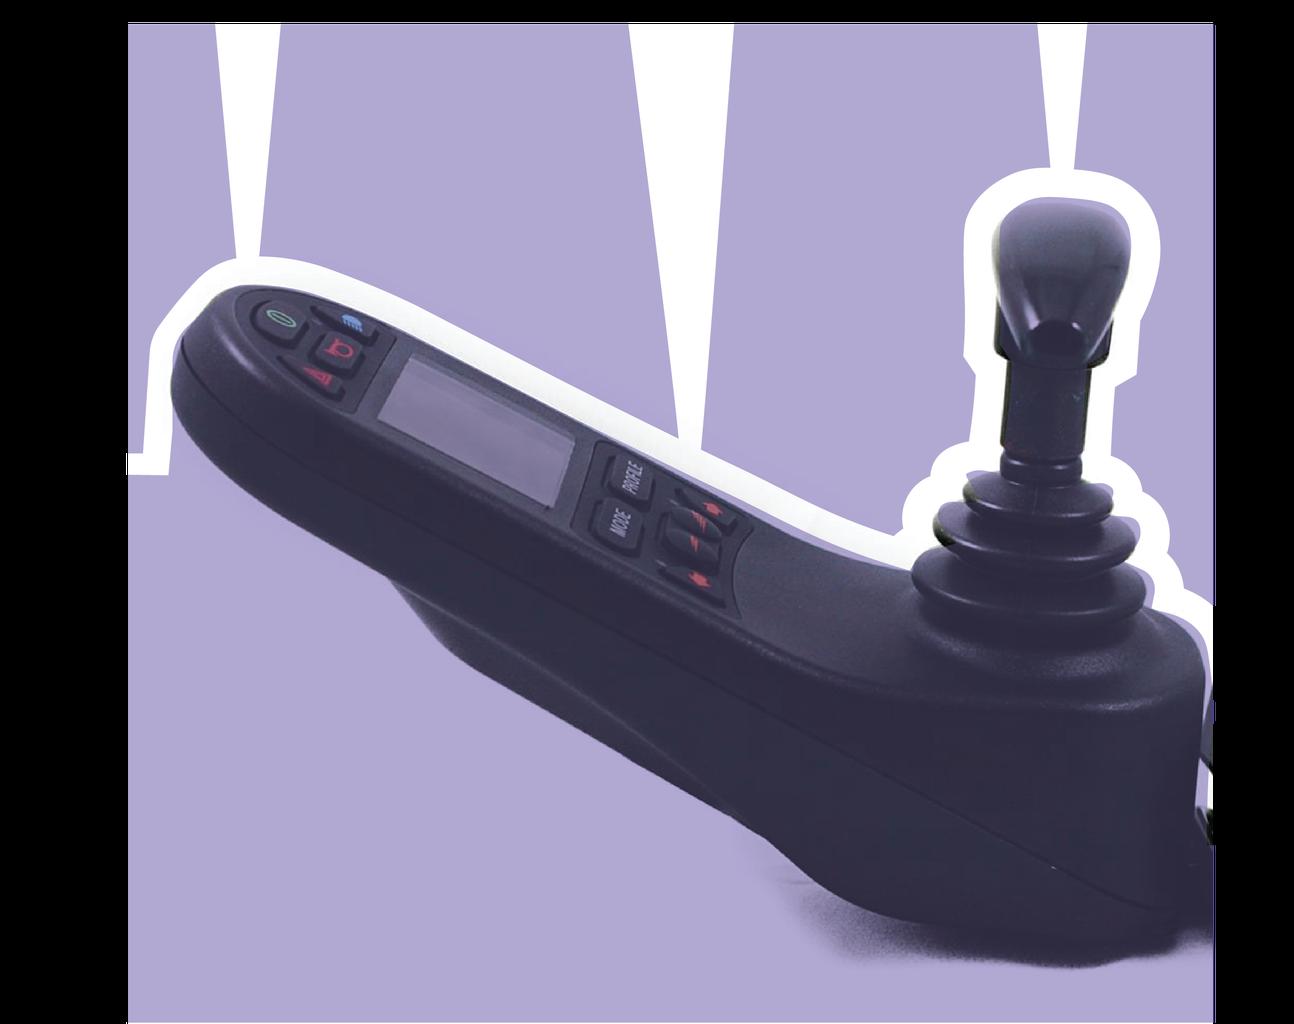 Print 3D Scan of Arm and Joystick